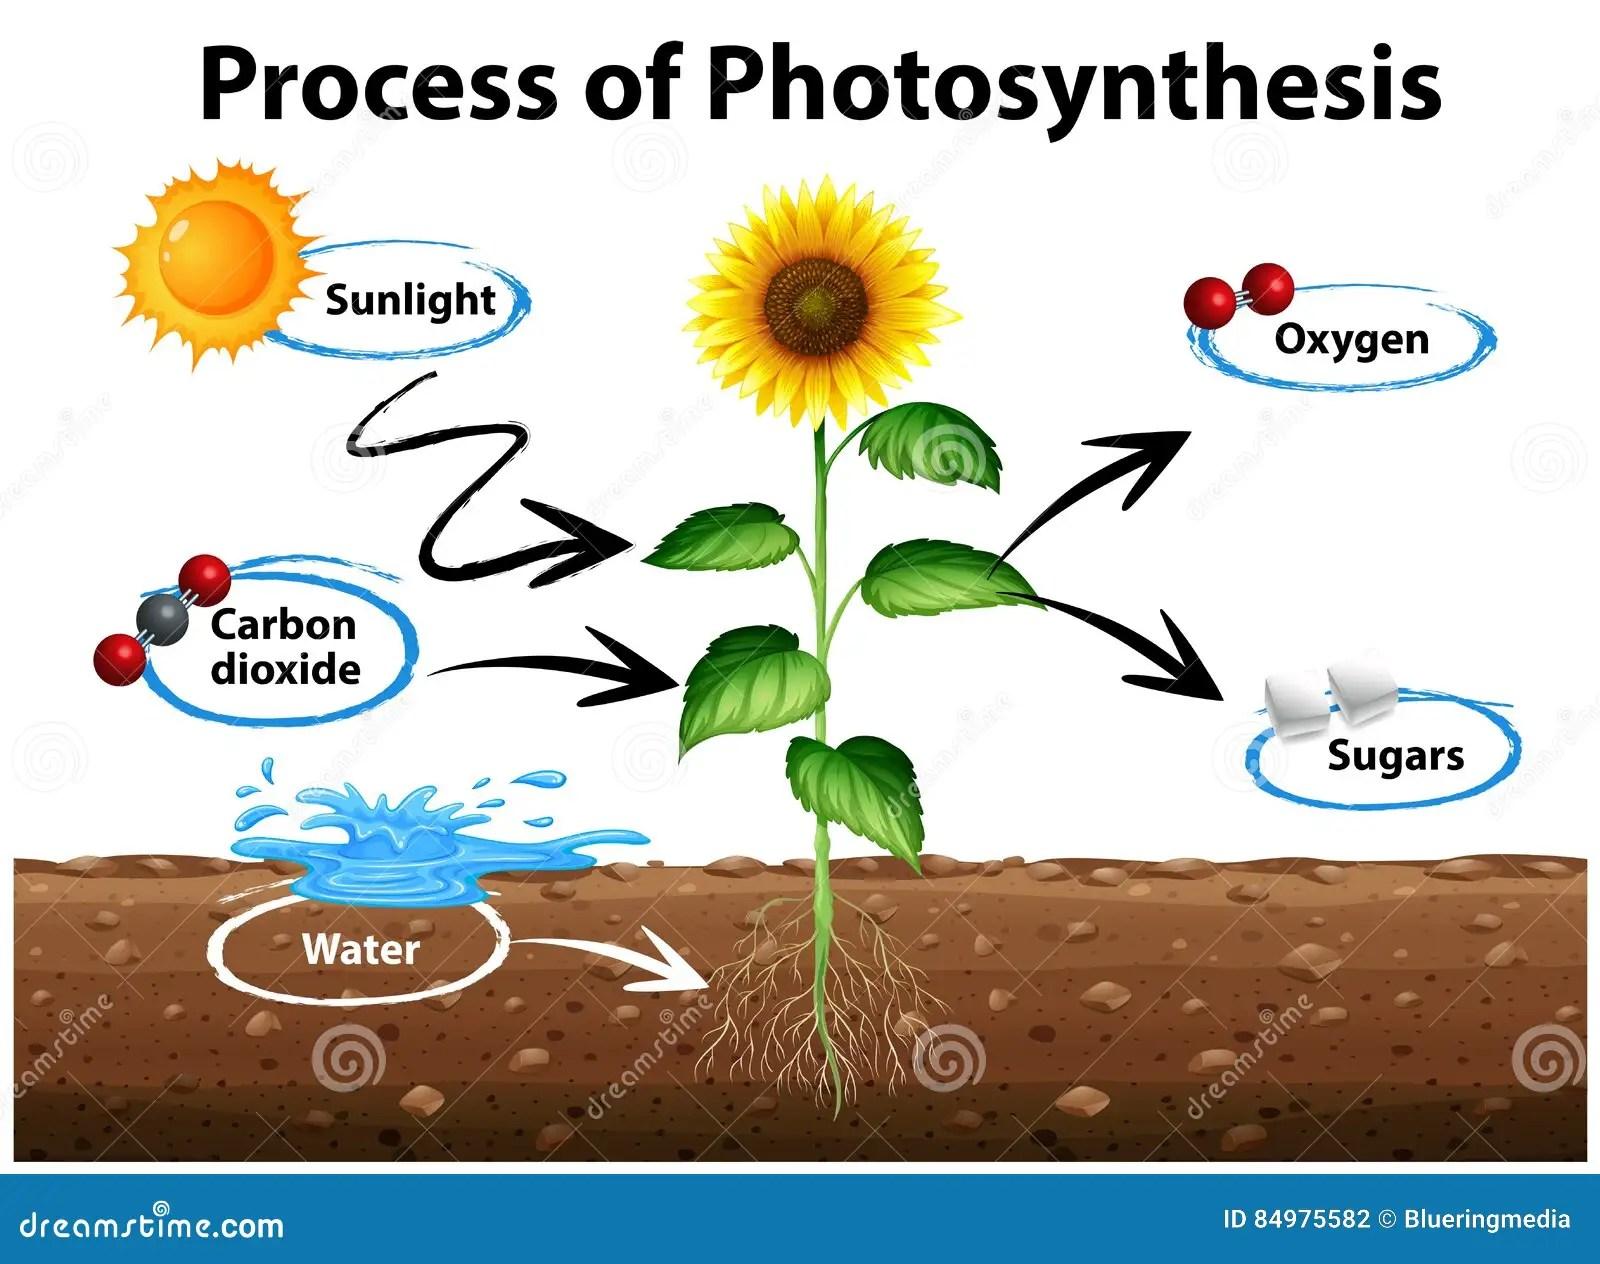 Diagram Zonnebloem En Proces Van Fotosynthese Tonen